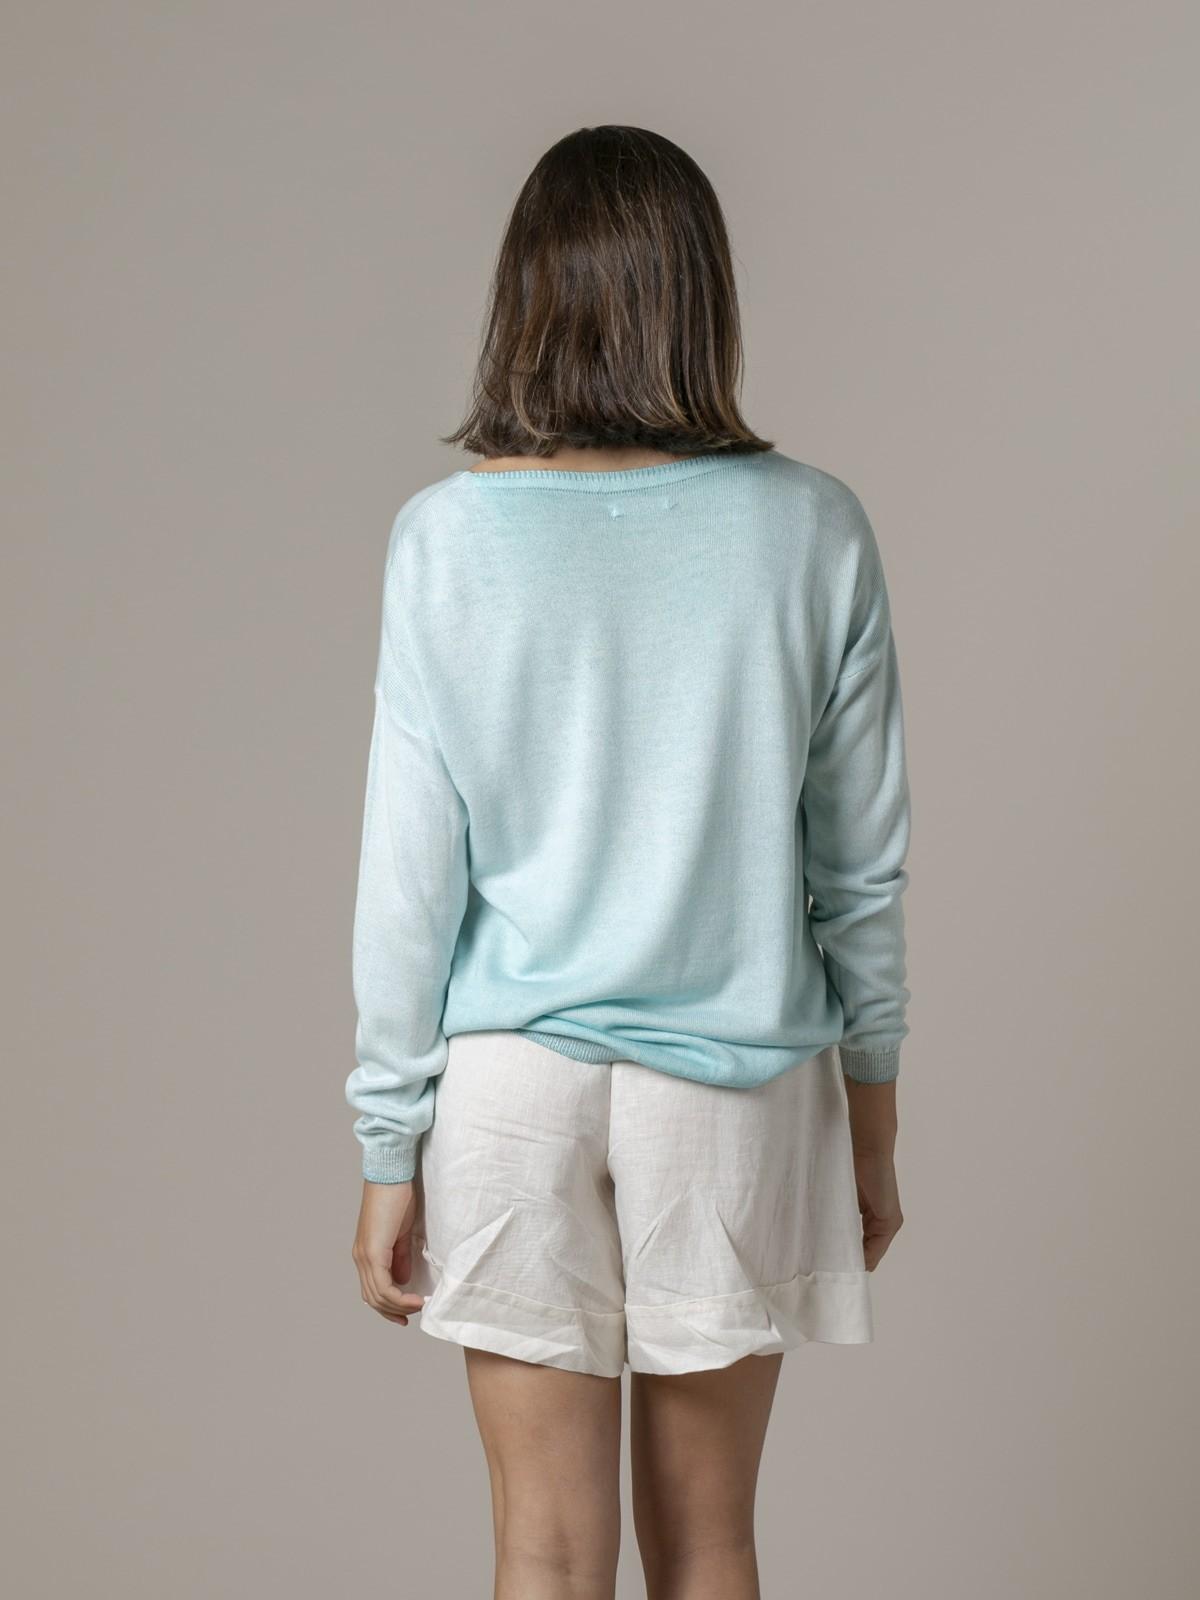 Jersey de mujer tinte degradé brillo Aqua